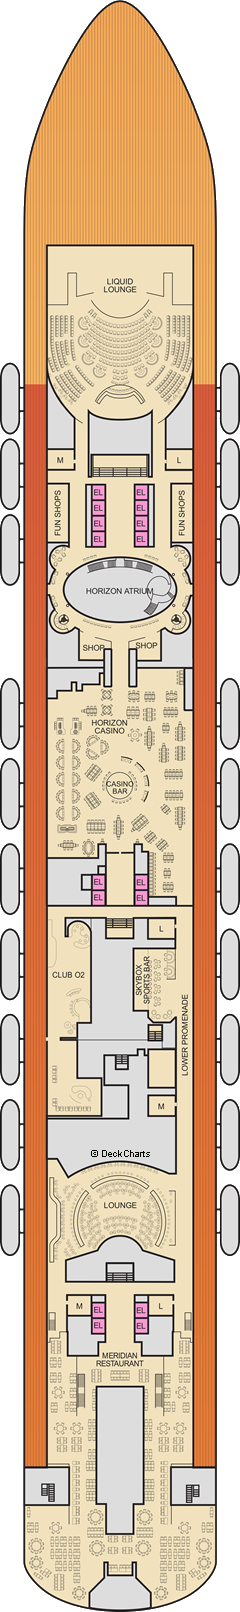 Carnival Horizon: Mezzanine Deck